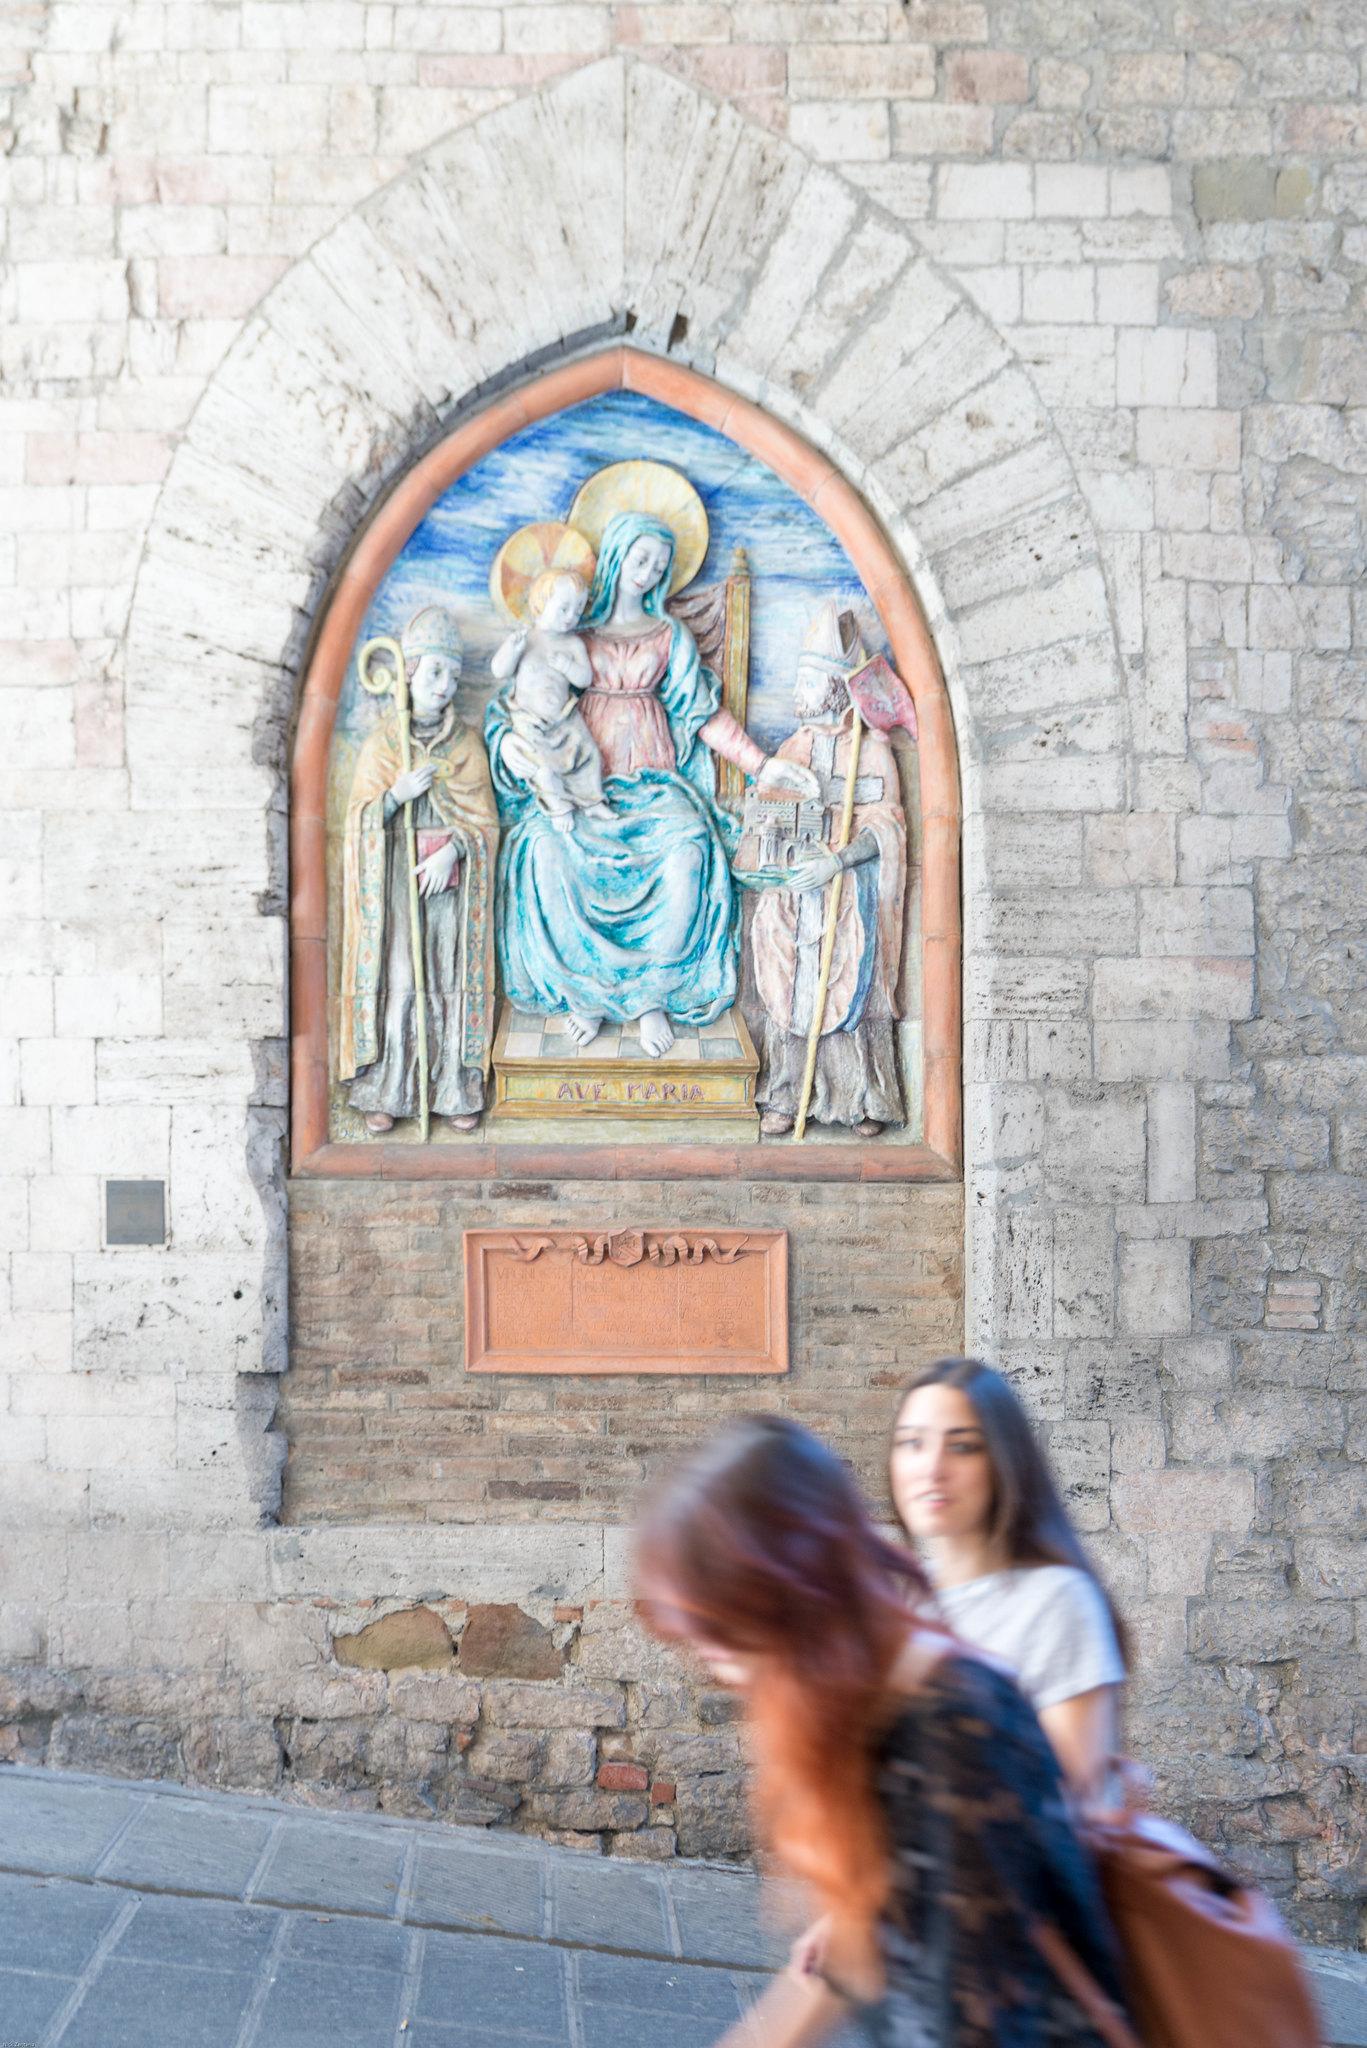 Art works hidden around the corner in Perugia Italy